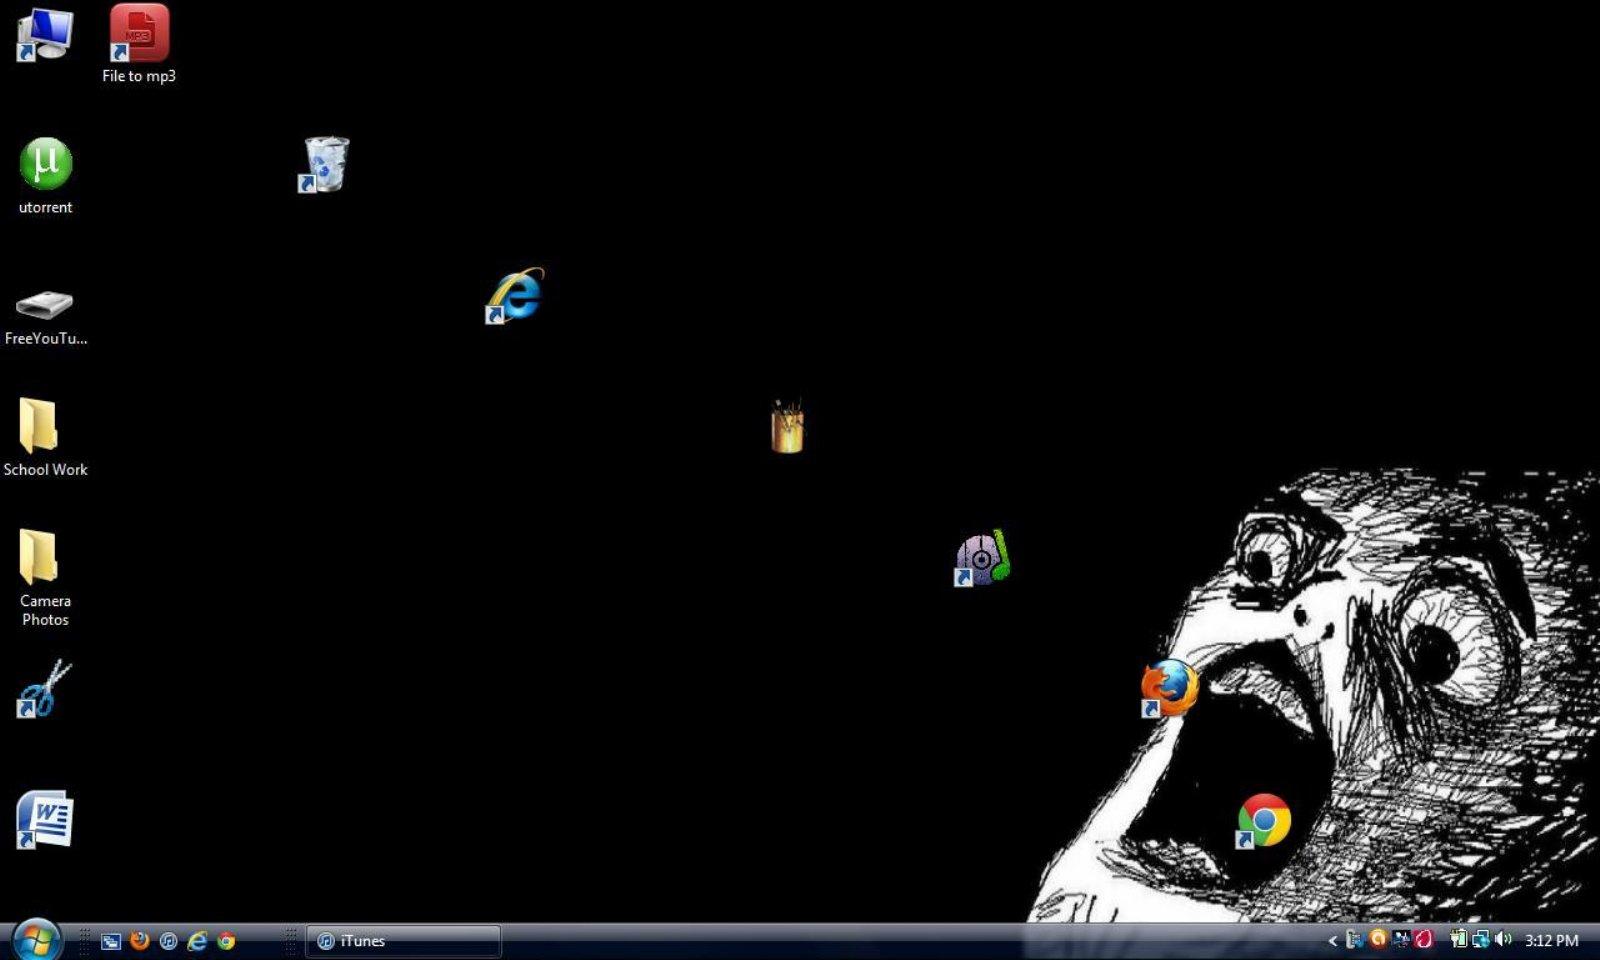 Work Funny Desktop Backgrounds 1600x960 Download Hd Wallpaper Wallpapertip